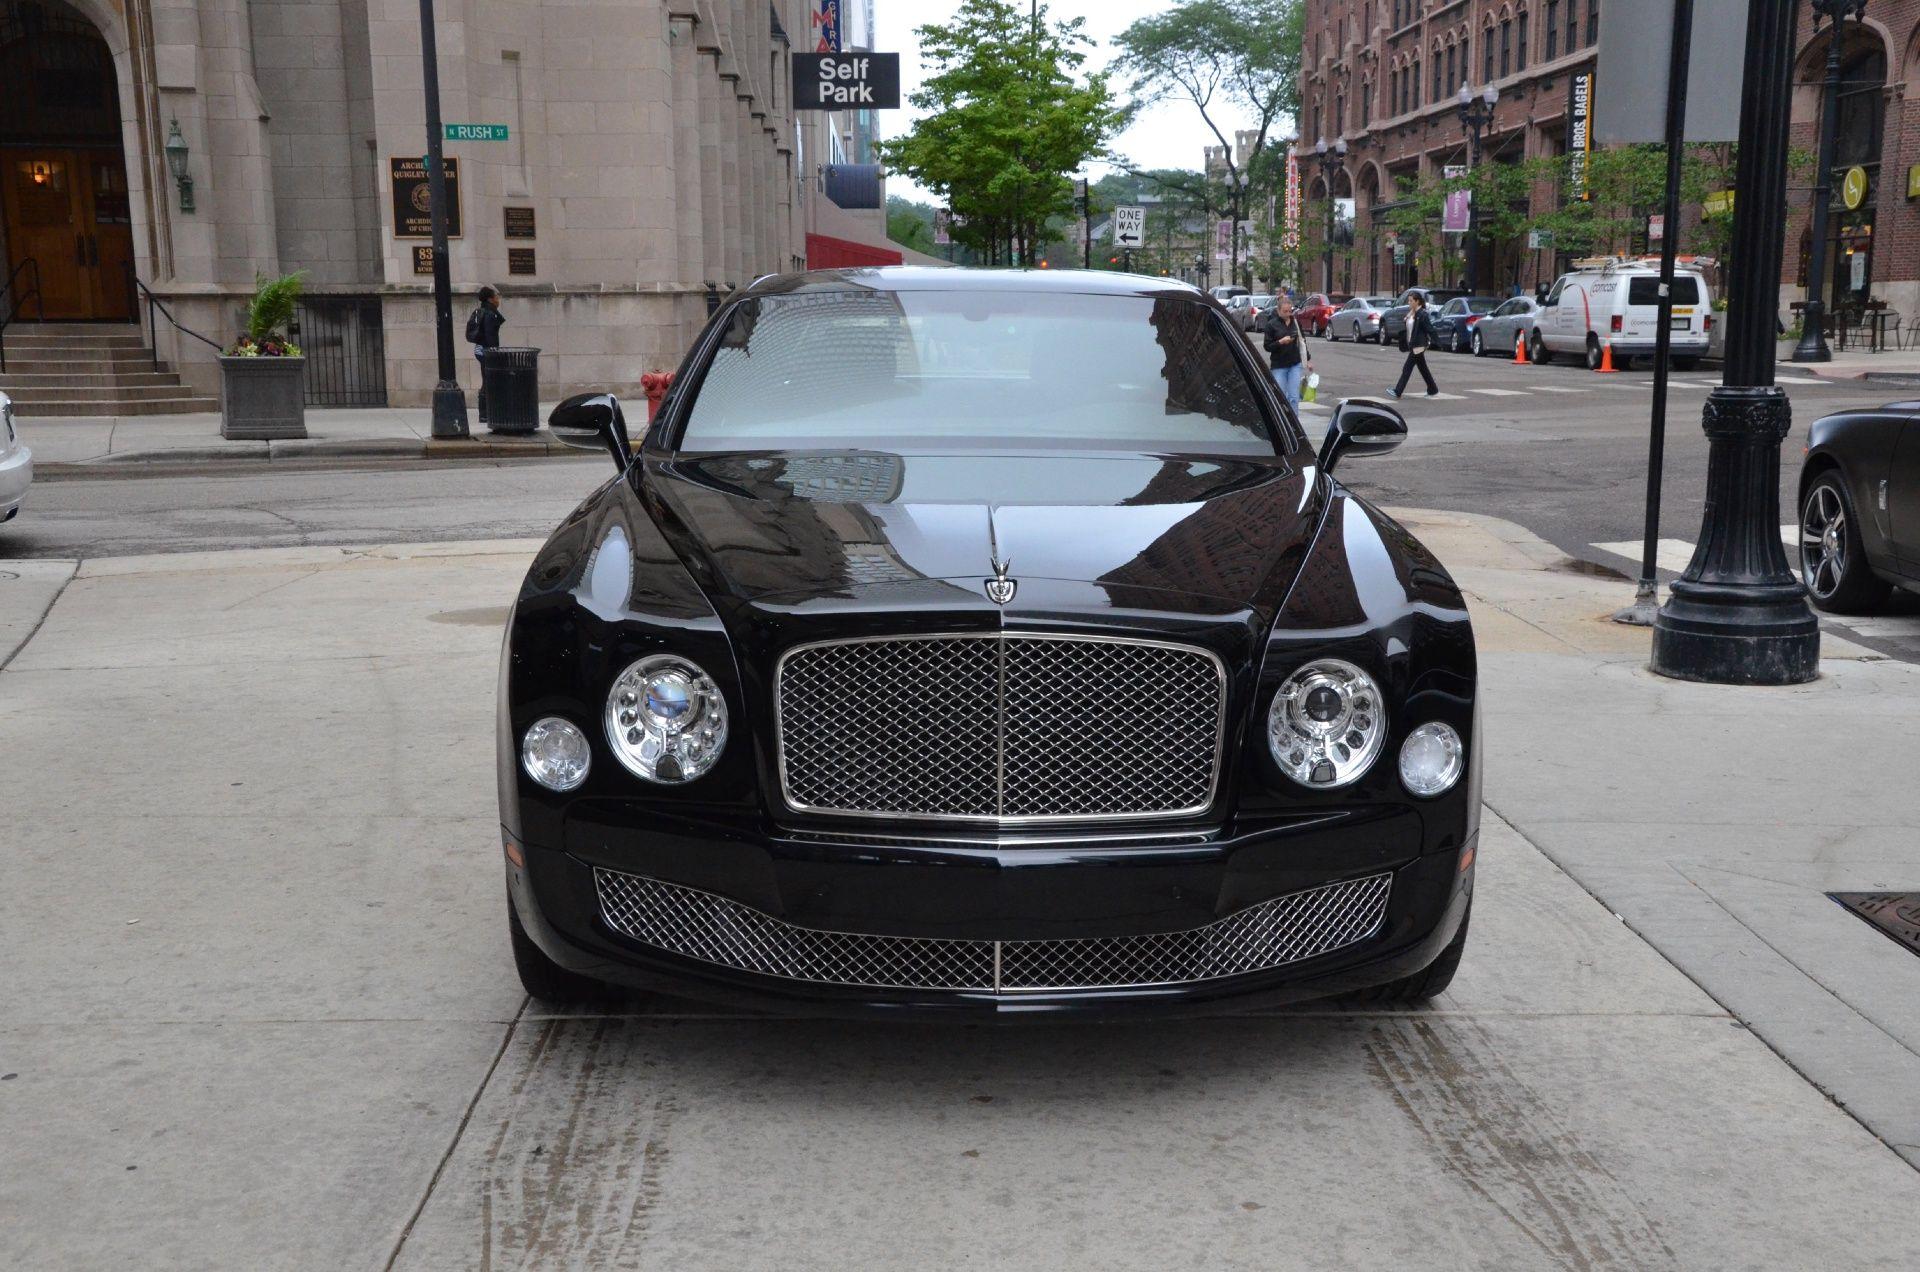 lux cars chicago il